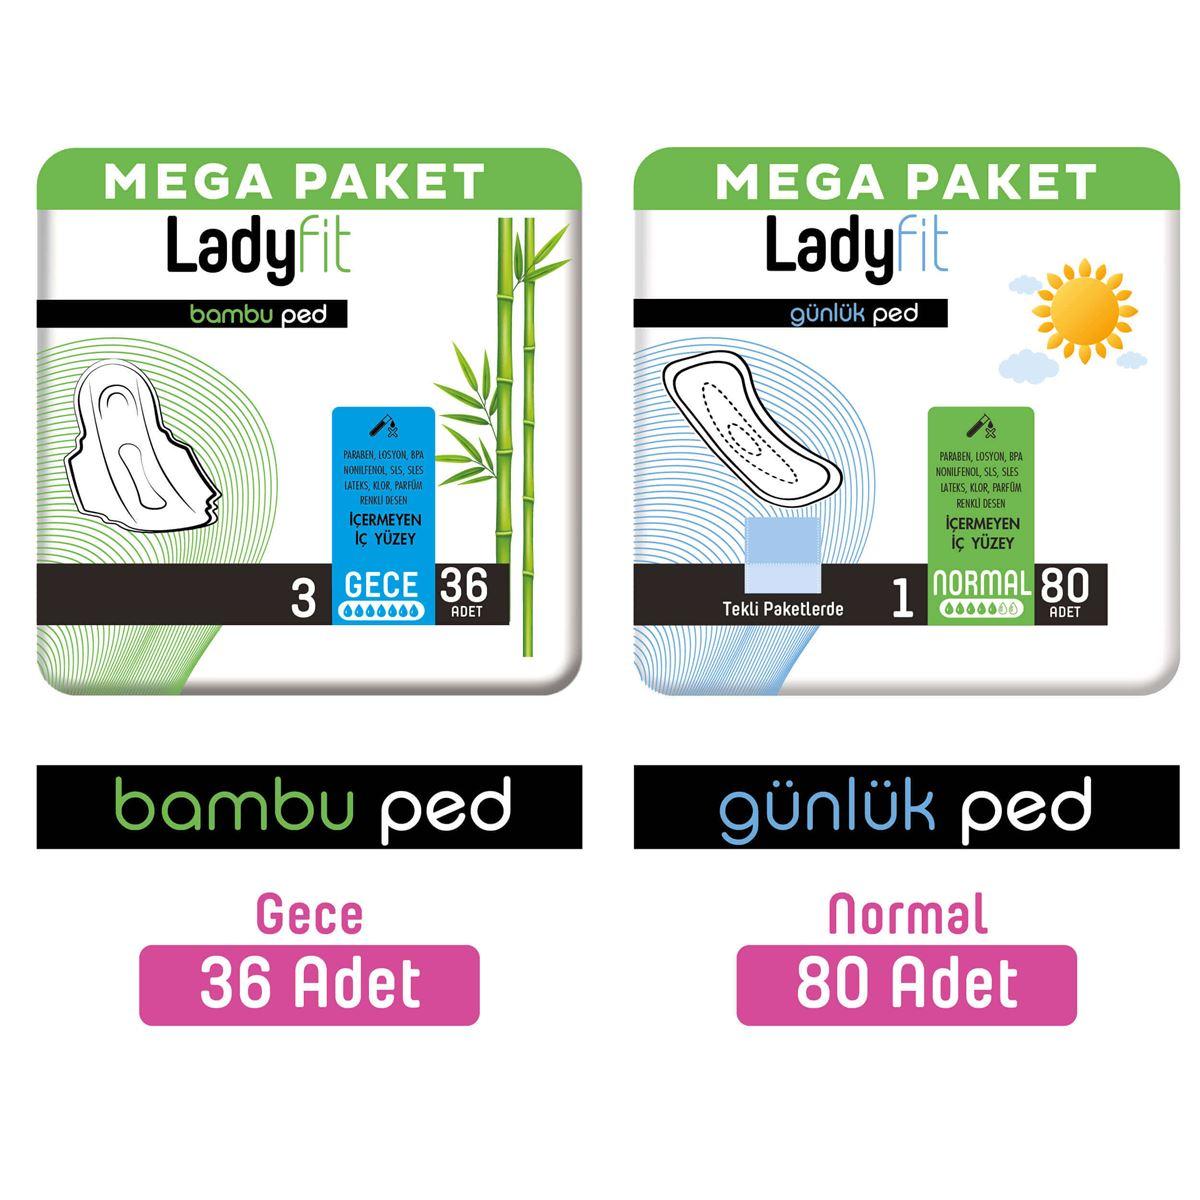 Ladyfit Bambu Ped Mega Gece 36 Adet + Günlük Ped Mega Normal 80 Adet